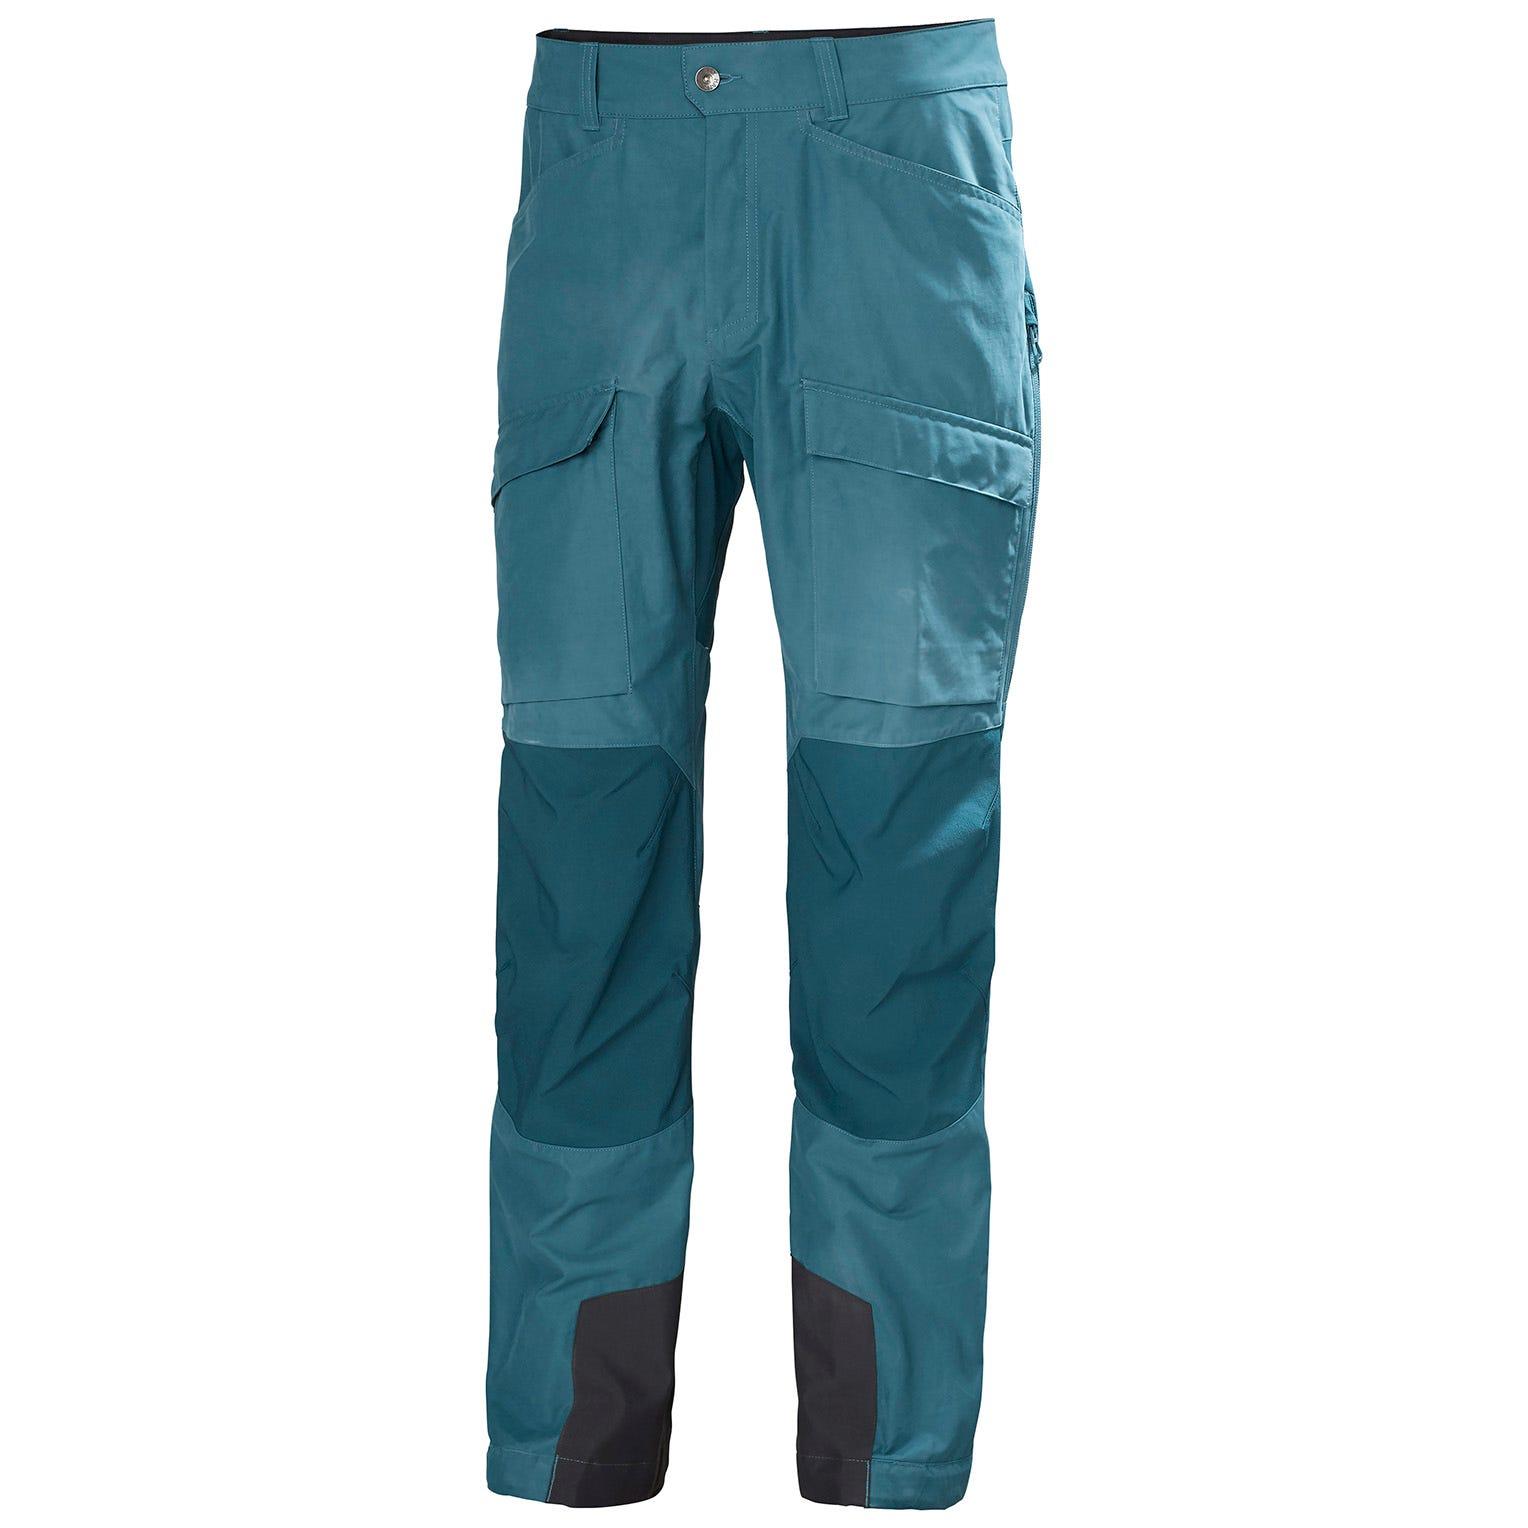 Helly Hansen Mens Veir Tur Stretch Trail Trousers XXL